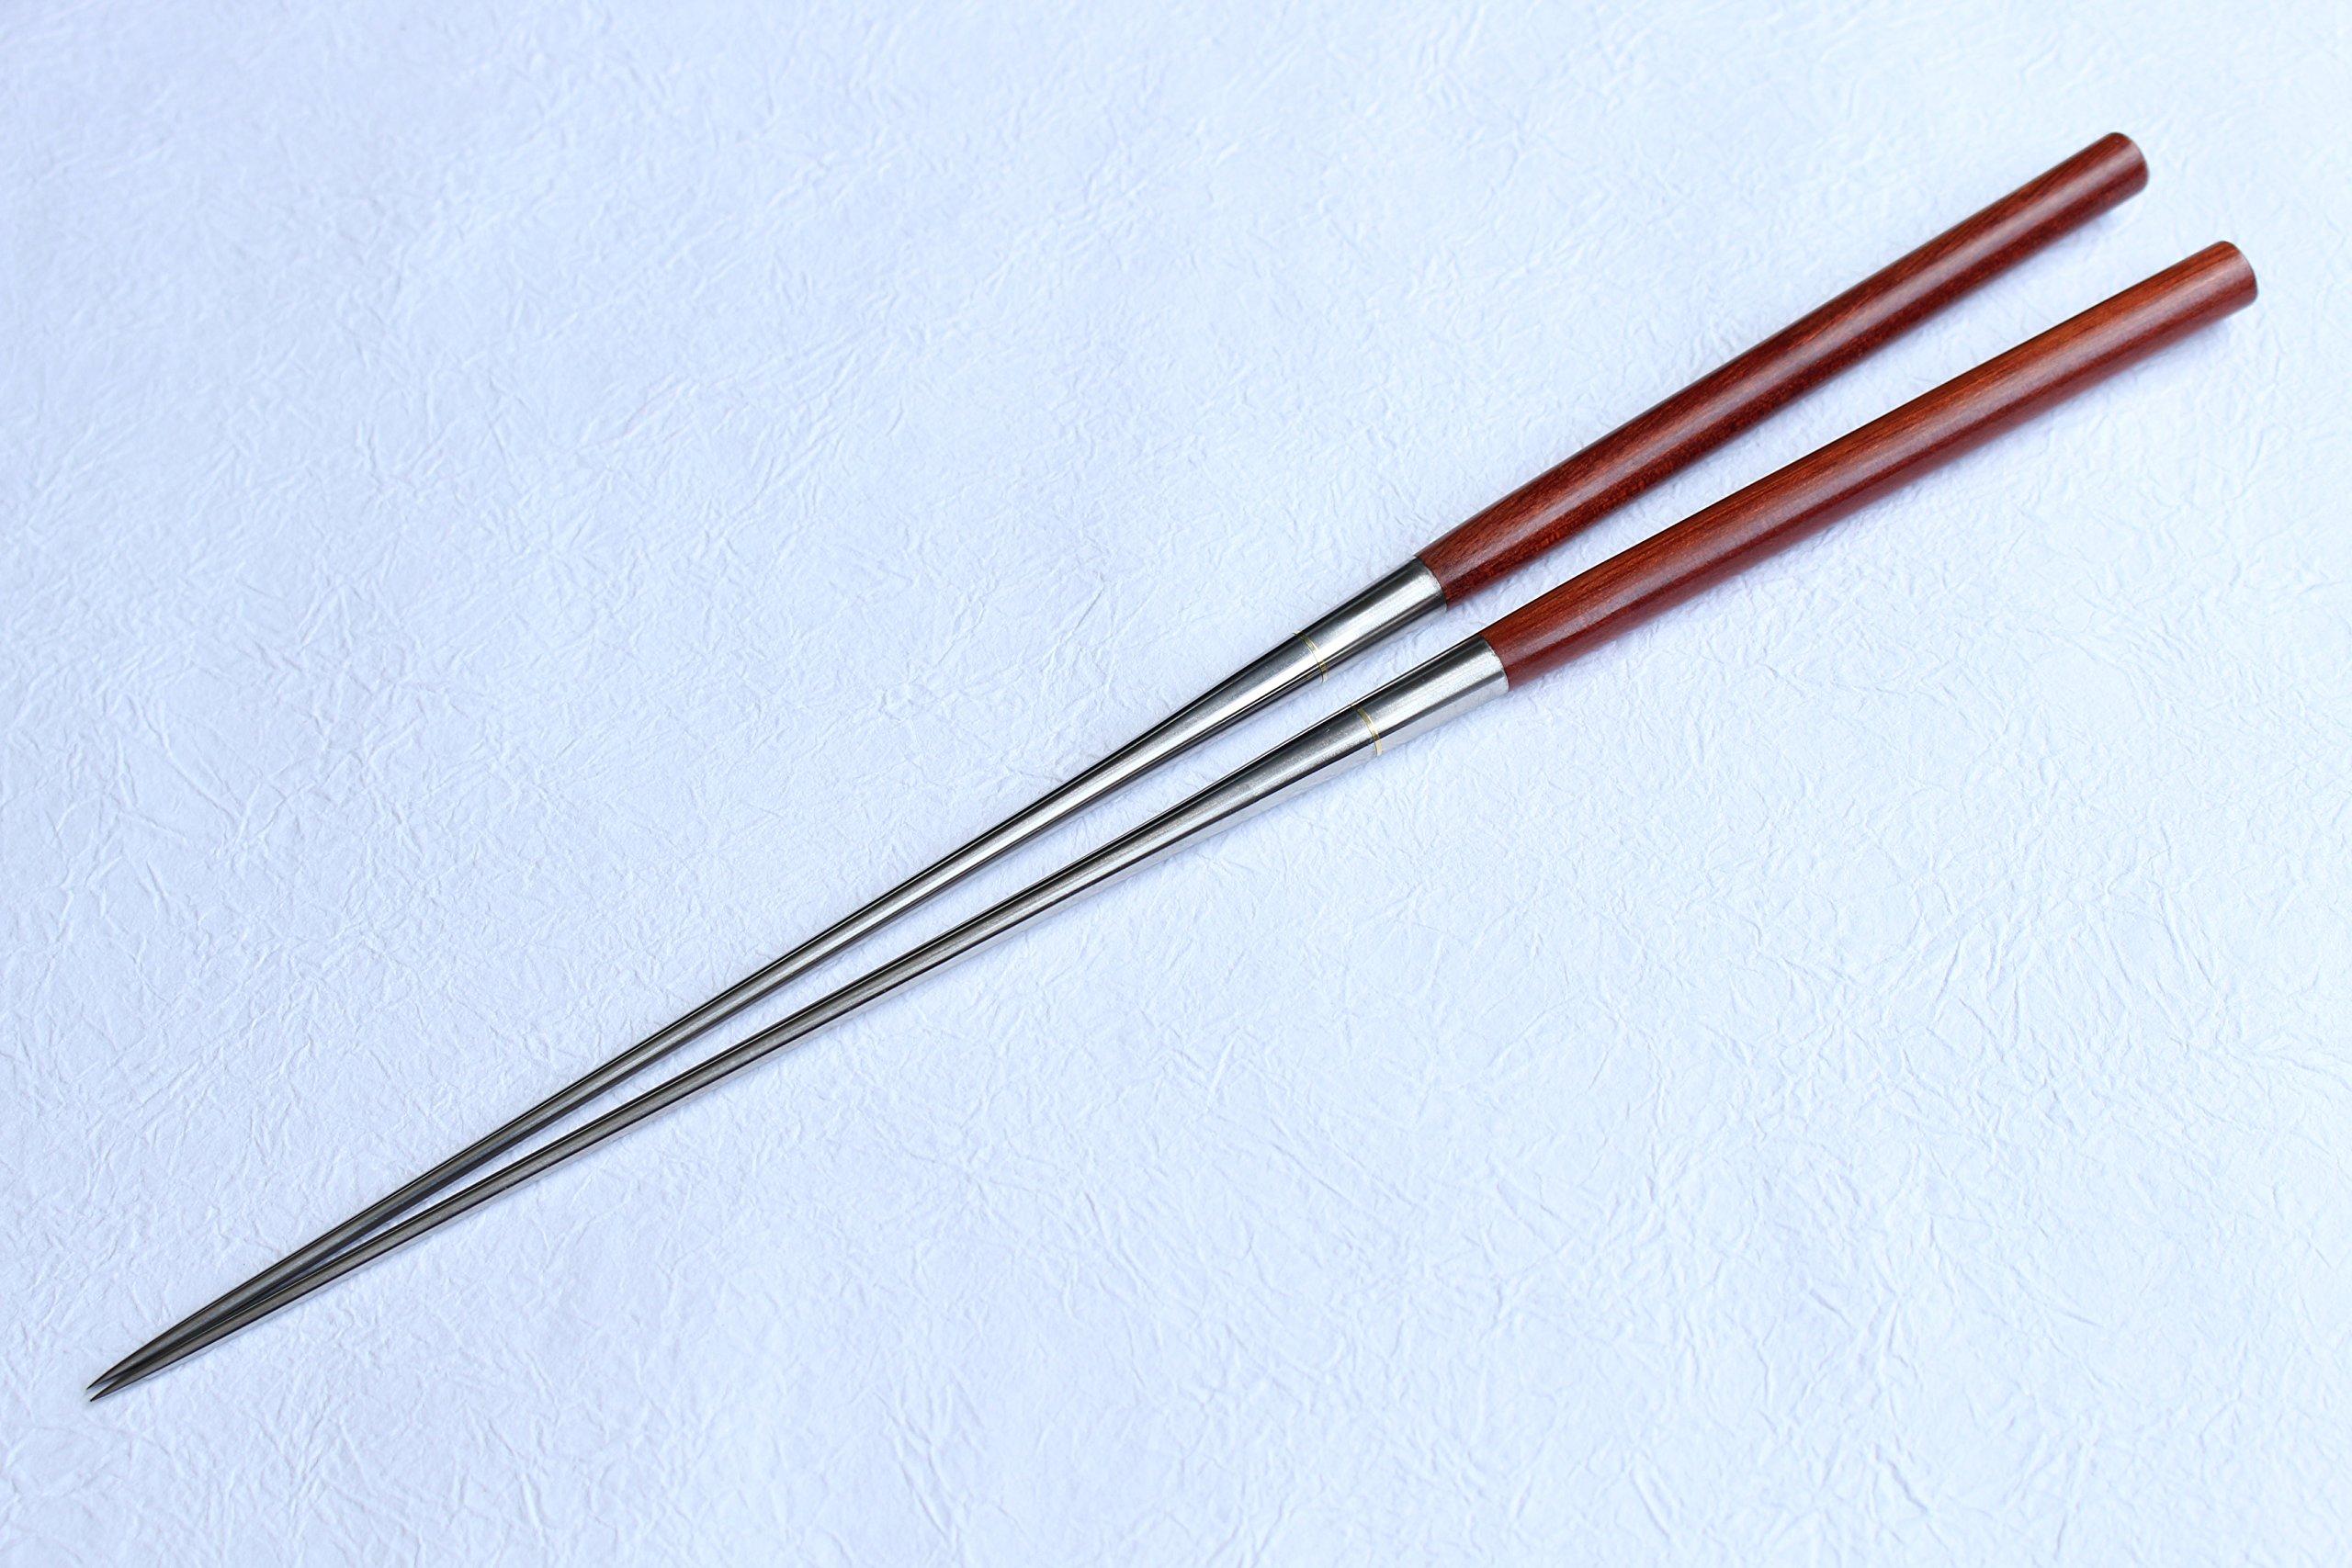 Ibuki Moribashi Chopsticks BloodWood Honyaki quenching stainless Japanese Sushi Chef's Garnishing 7.1 inch (180mm)